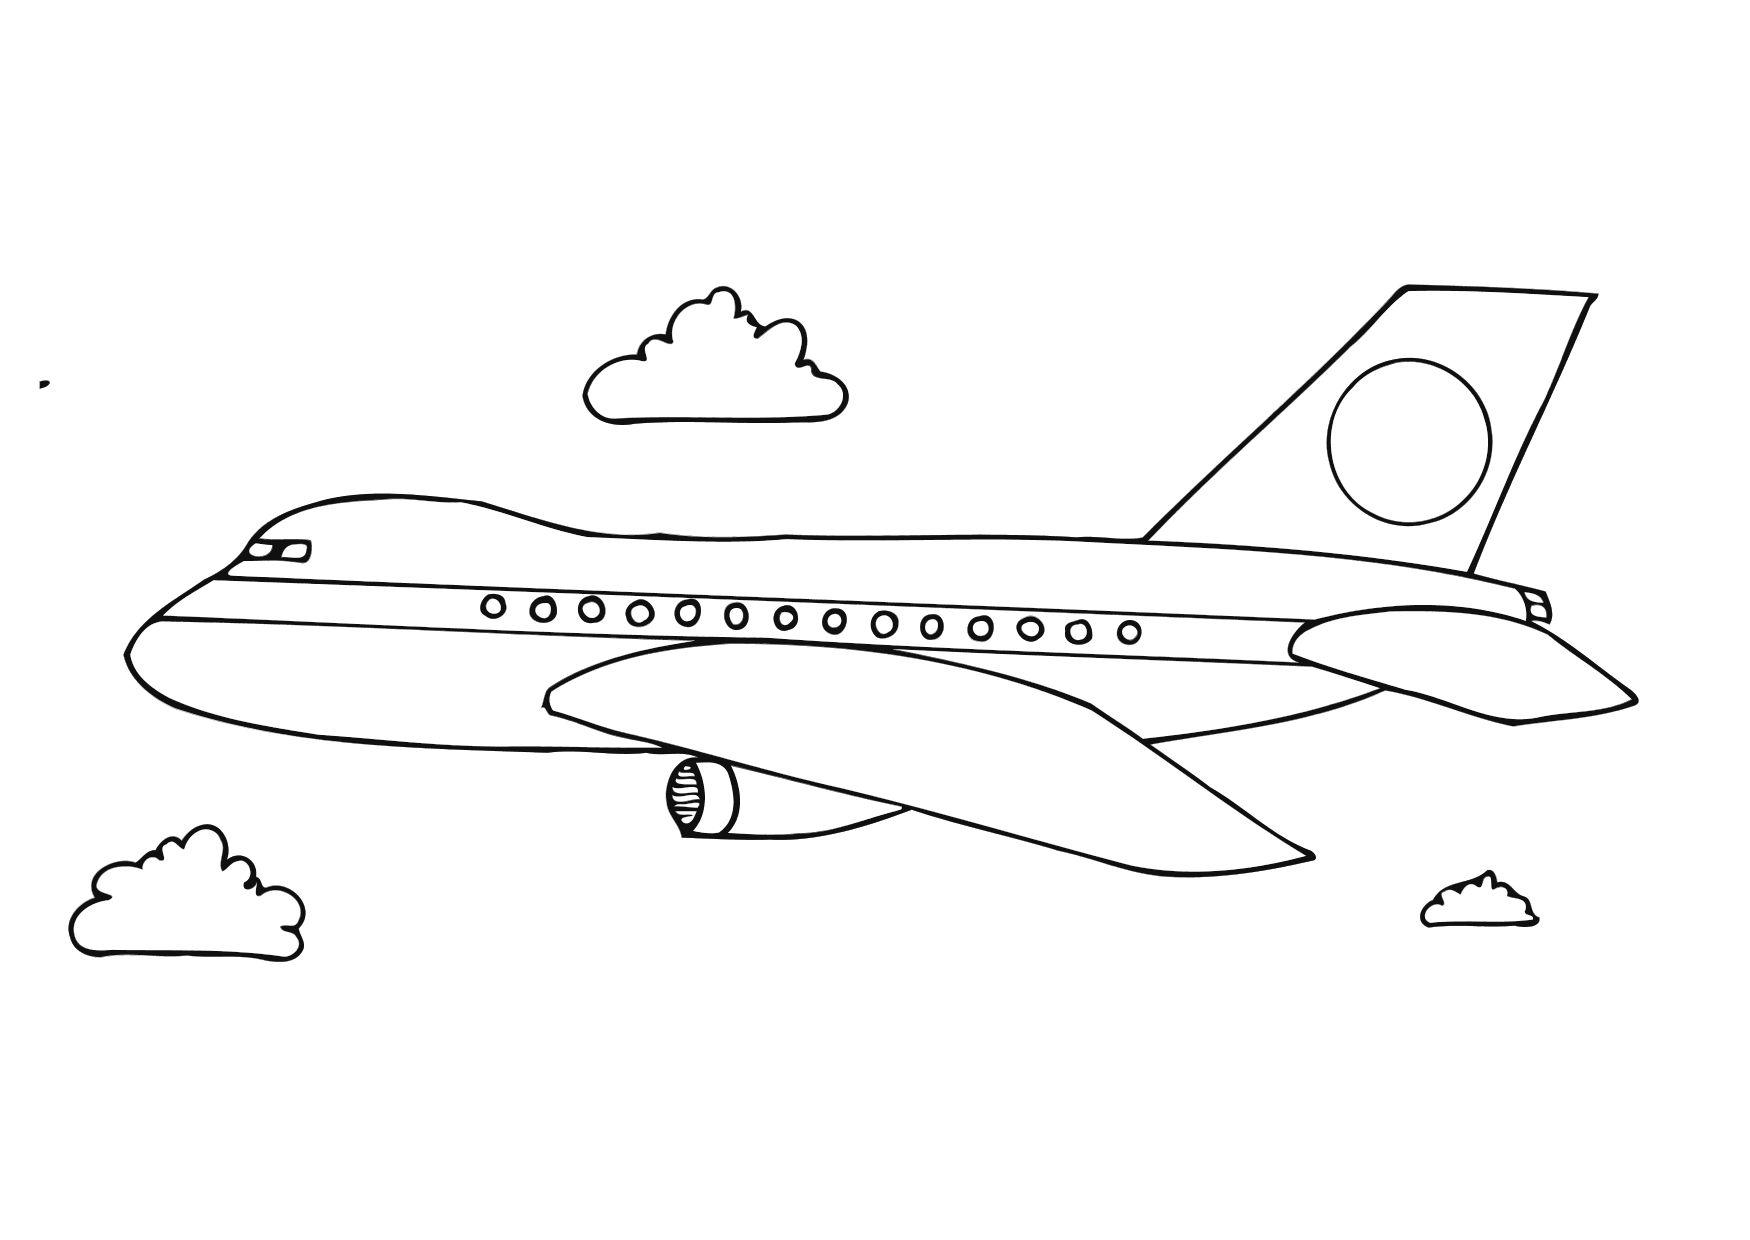 plane coloring sheets free printable airplane coloring pages for kids cool2bkids plane coloring sheets 1 3